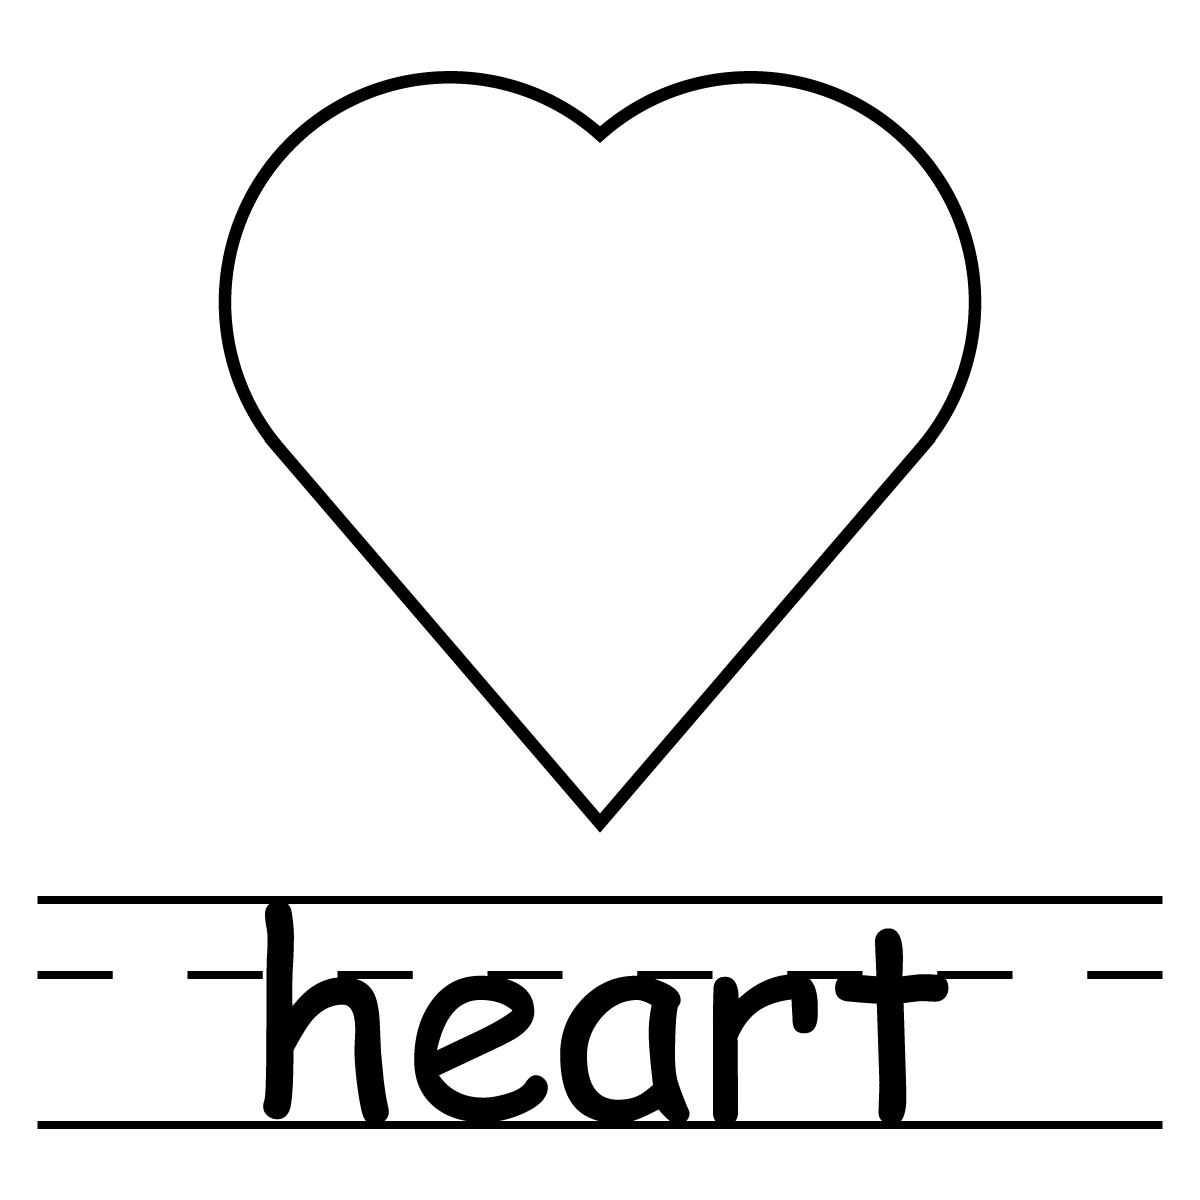 Clipart Heart Shape Clipart Panda